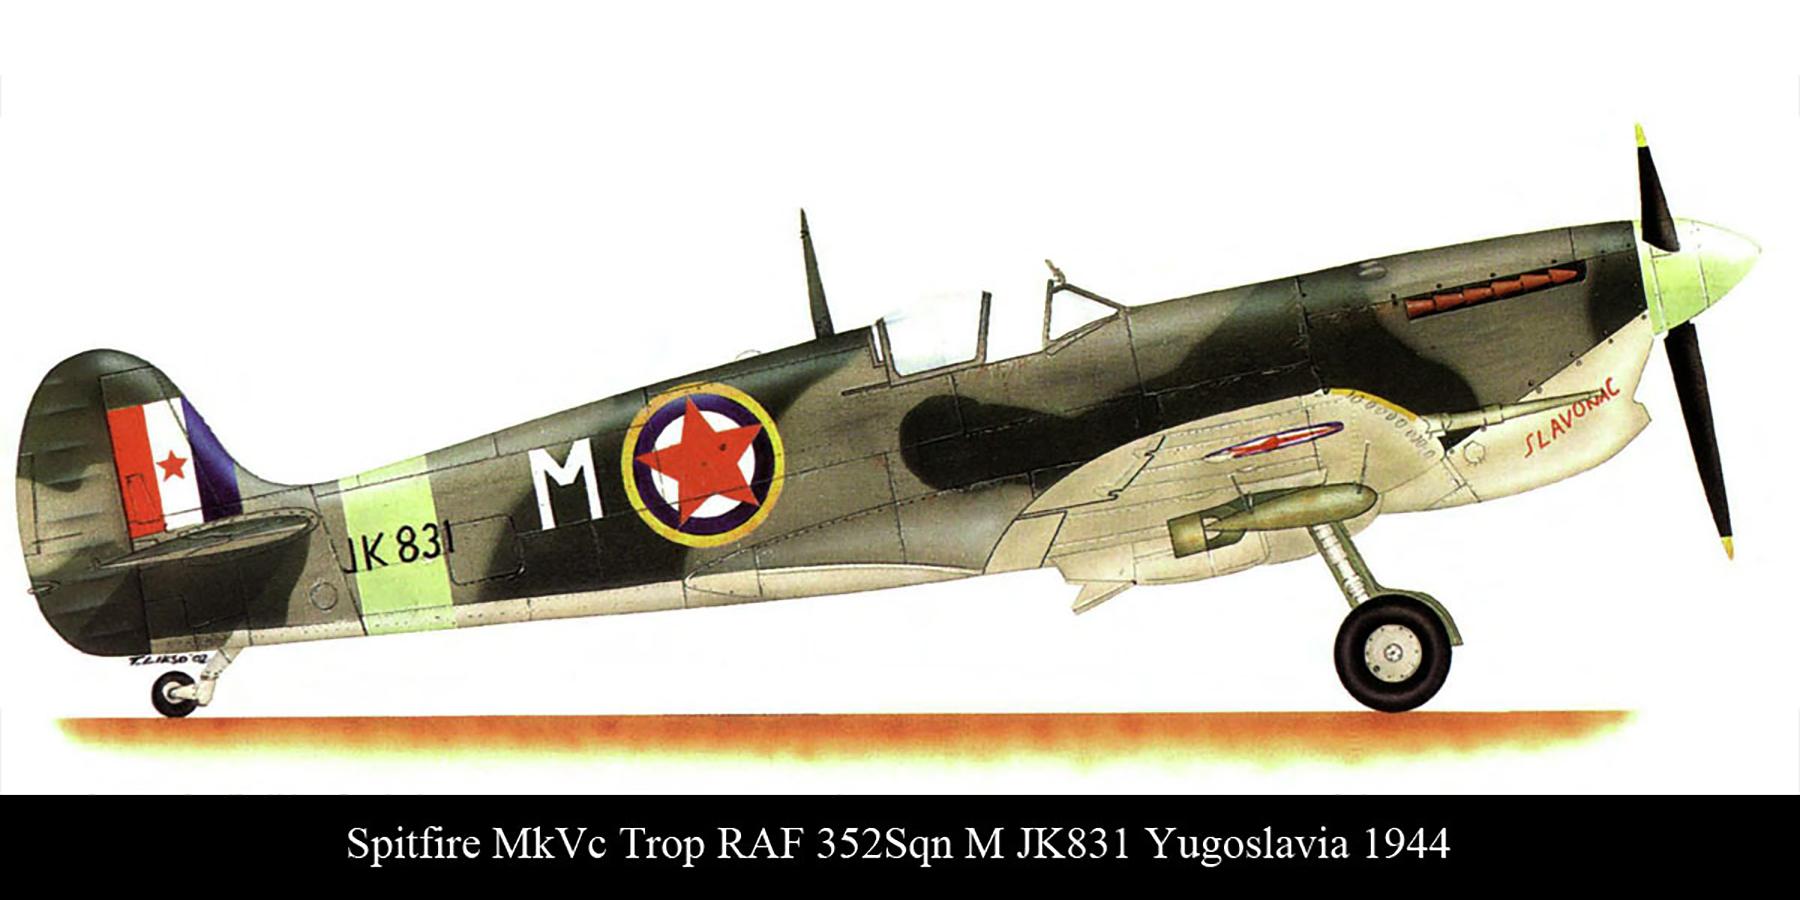 Spitfire MkVcTrop RAF 352Sqn M JK544 Yugoslavia Aug 1944 00